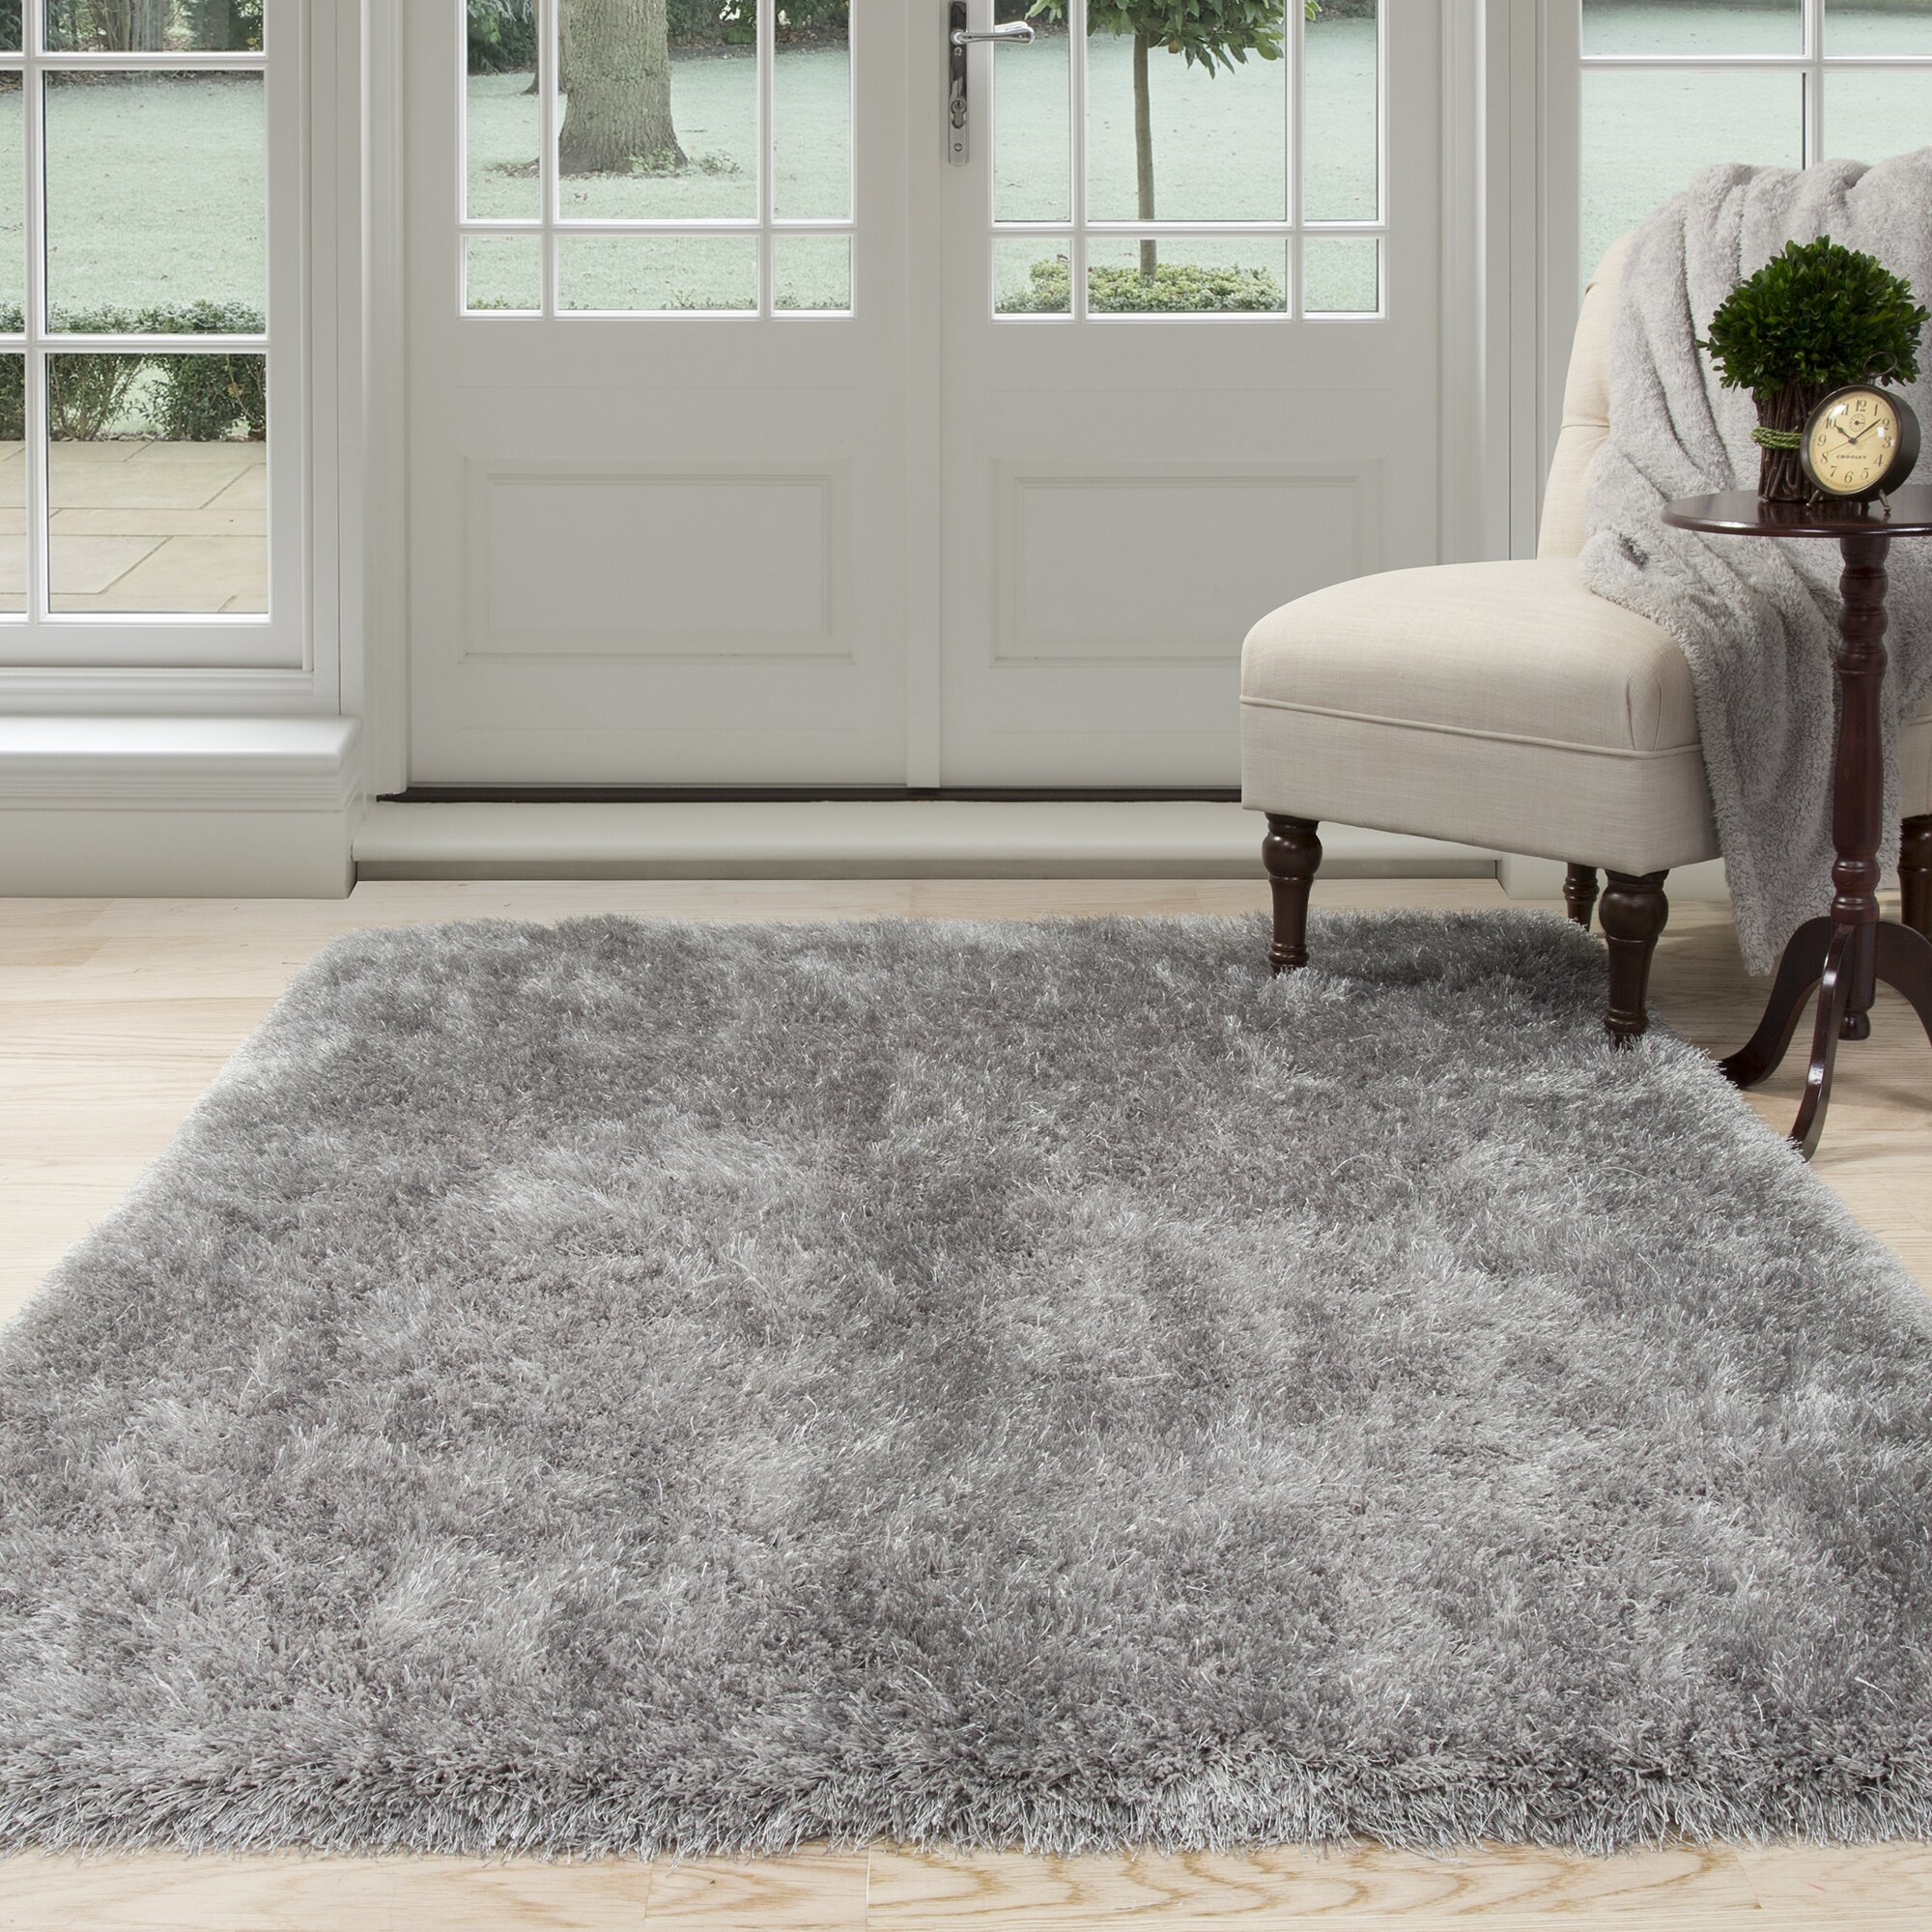 lavish home gray shag area rug